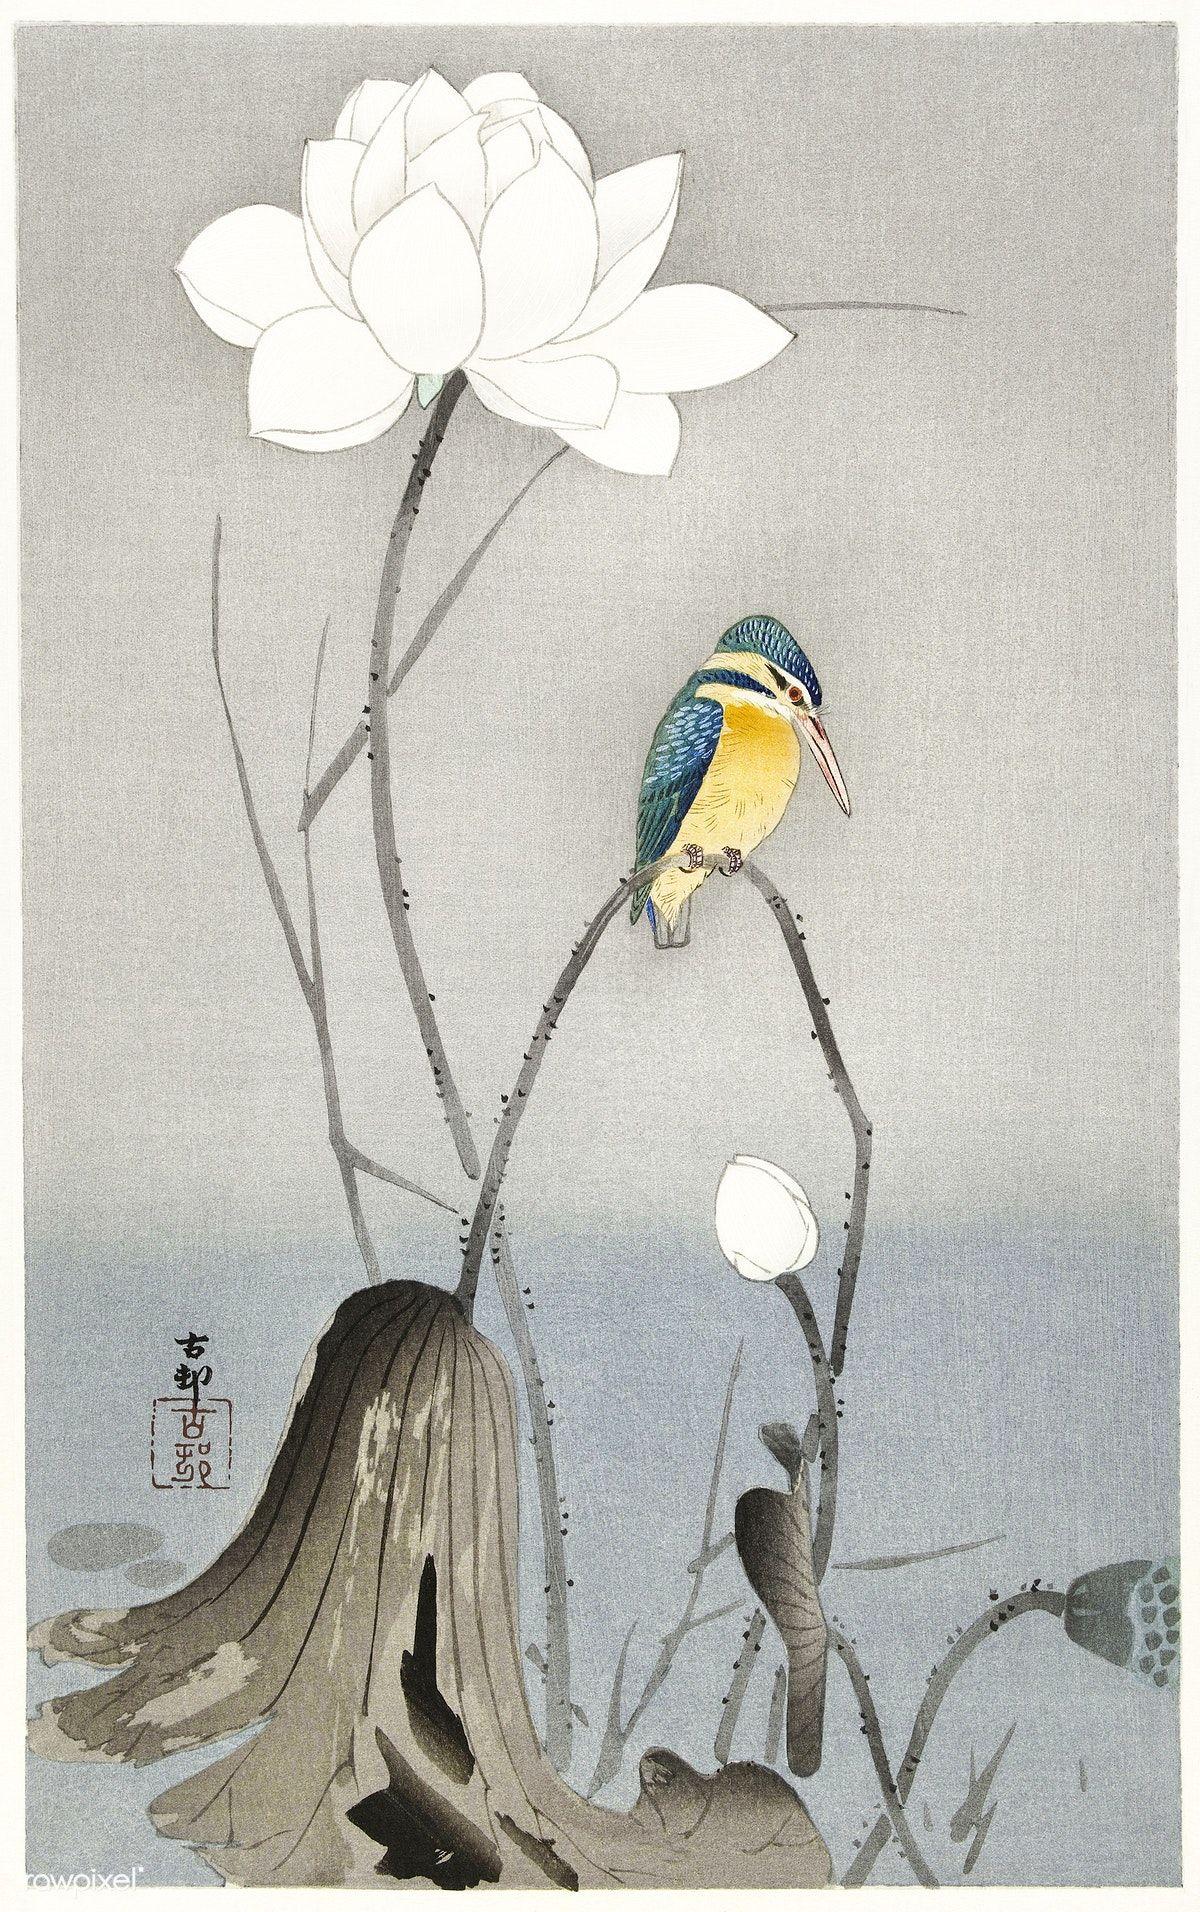 Kingfisher with Lotus Flower (1900 - 1945) by Ohara Koson (1877-1945). Original from the Rijks Museum. Digitally… | Flower art painting, Lotus art, Lotus flower art